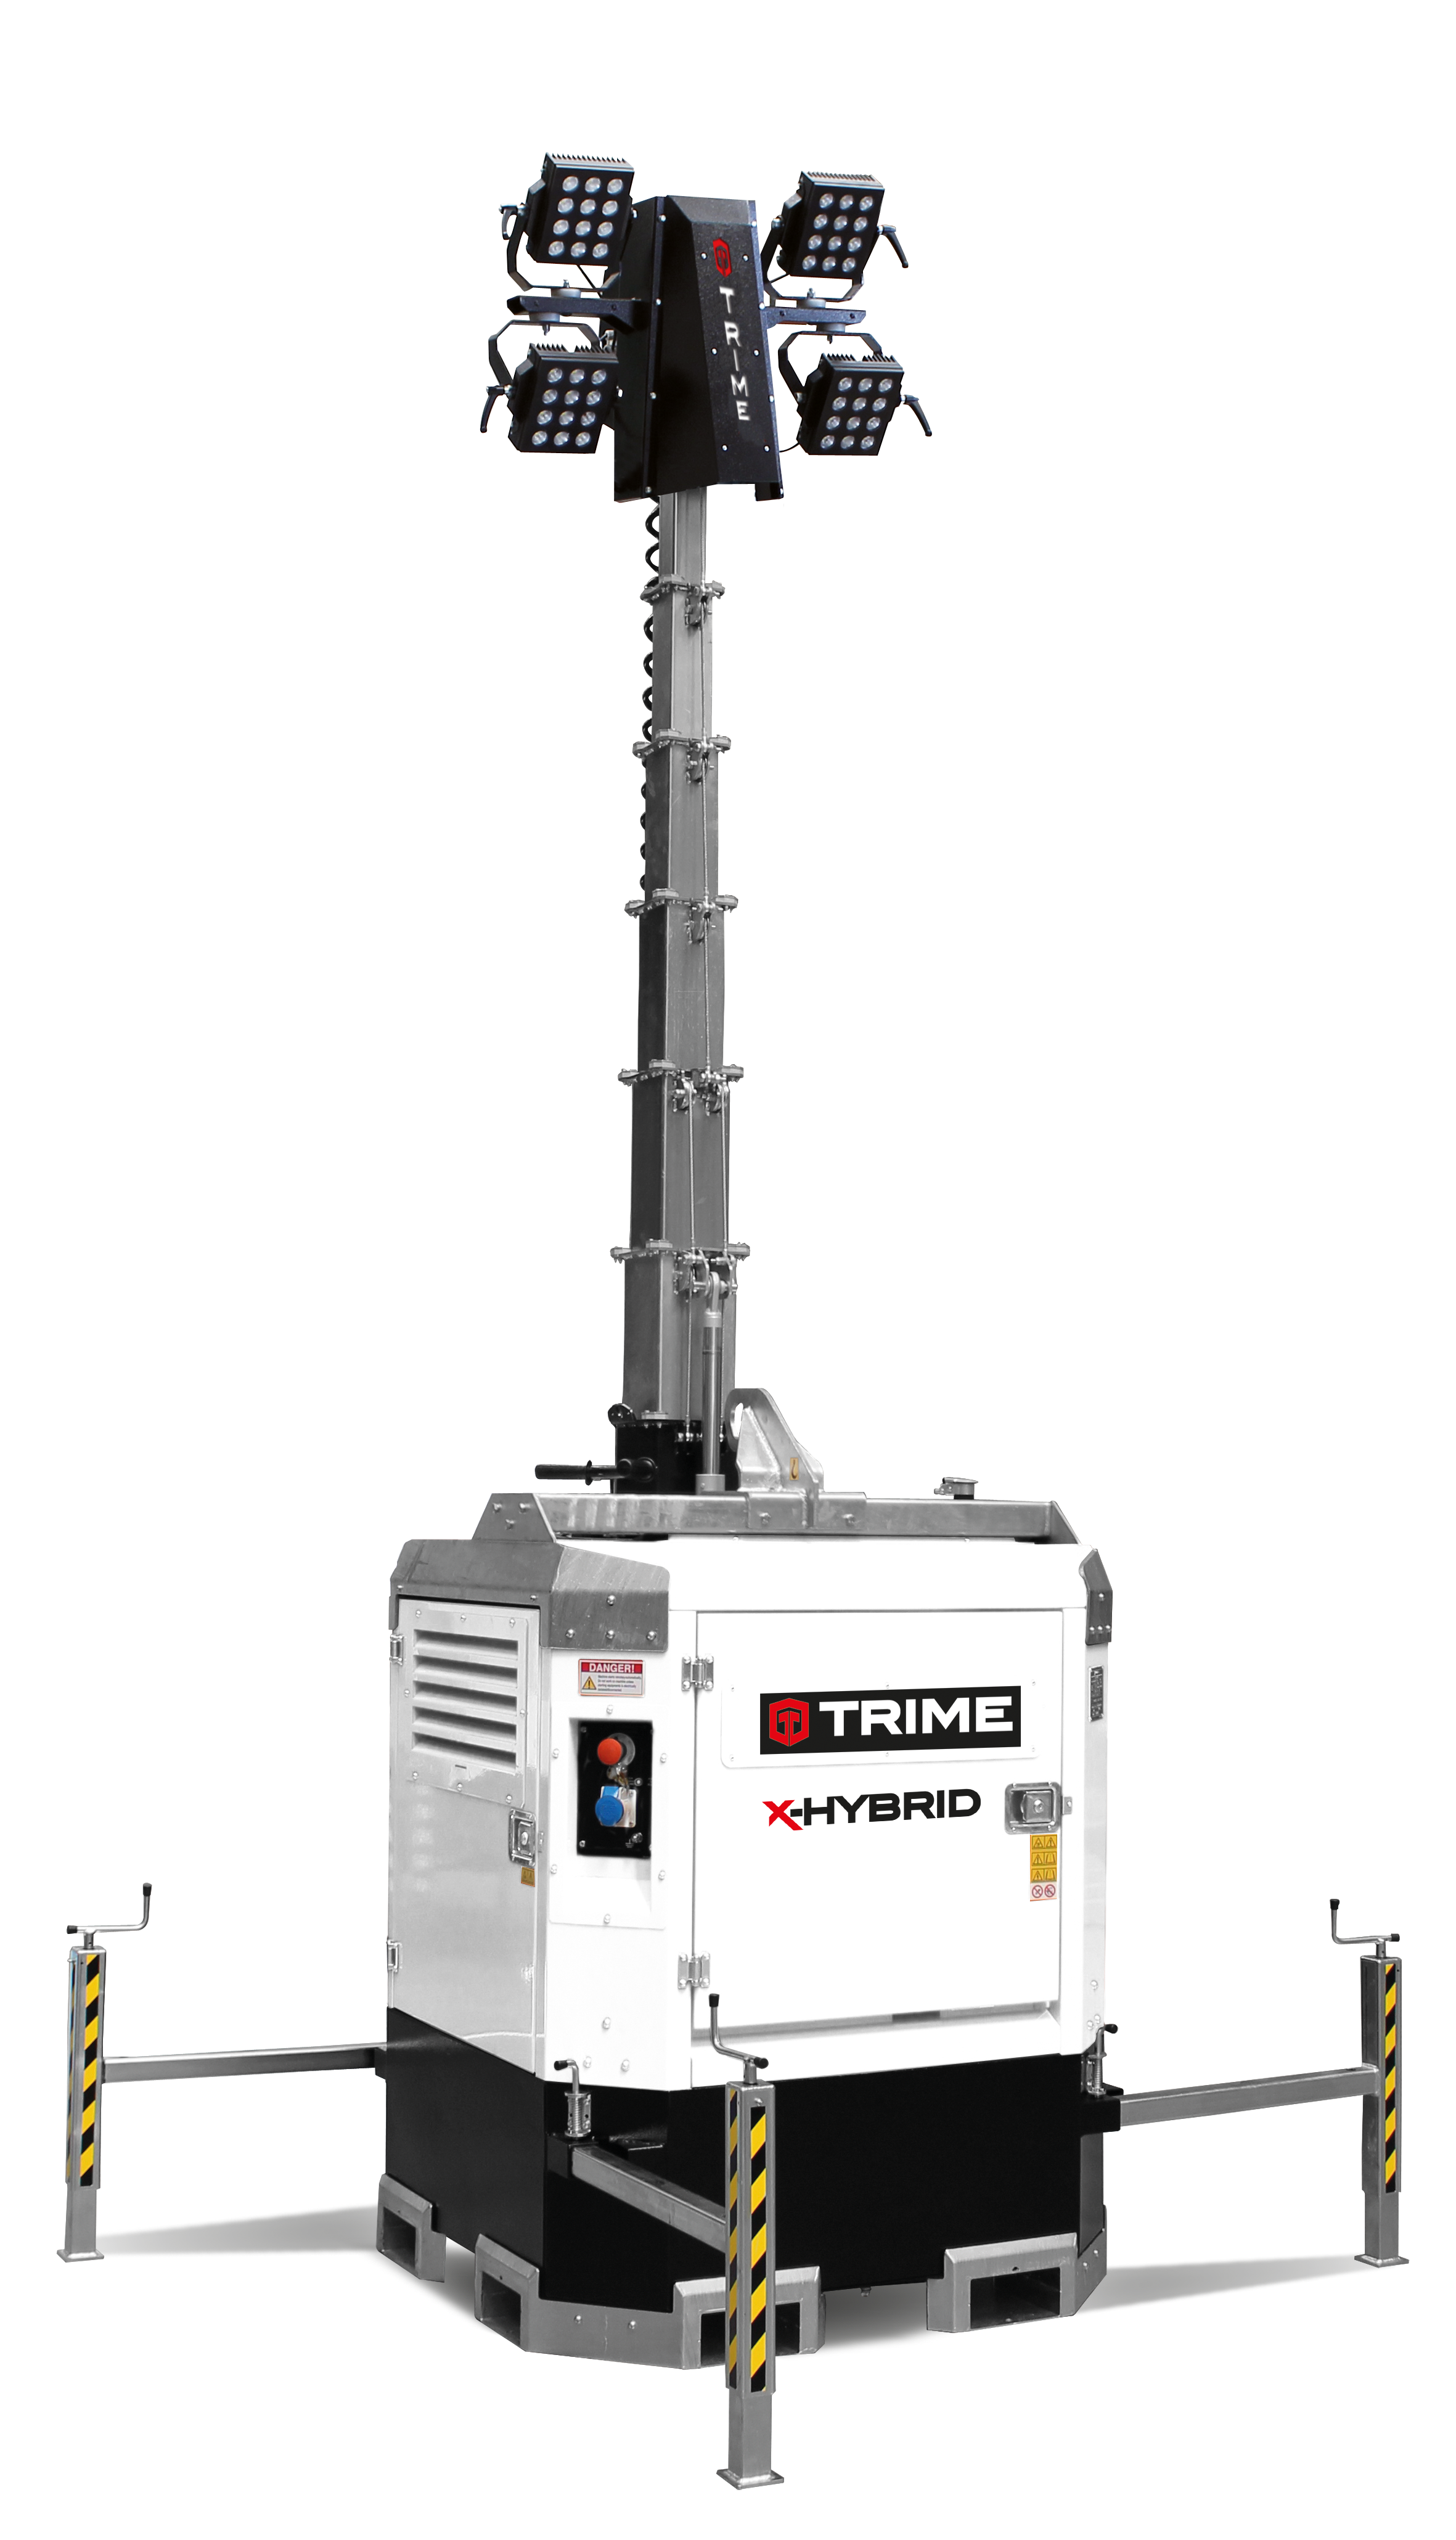 Hybrid Lighting Towers - the Q&A